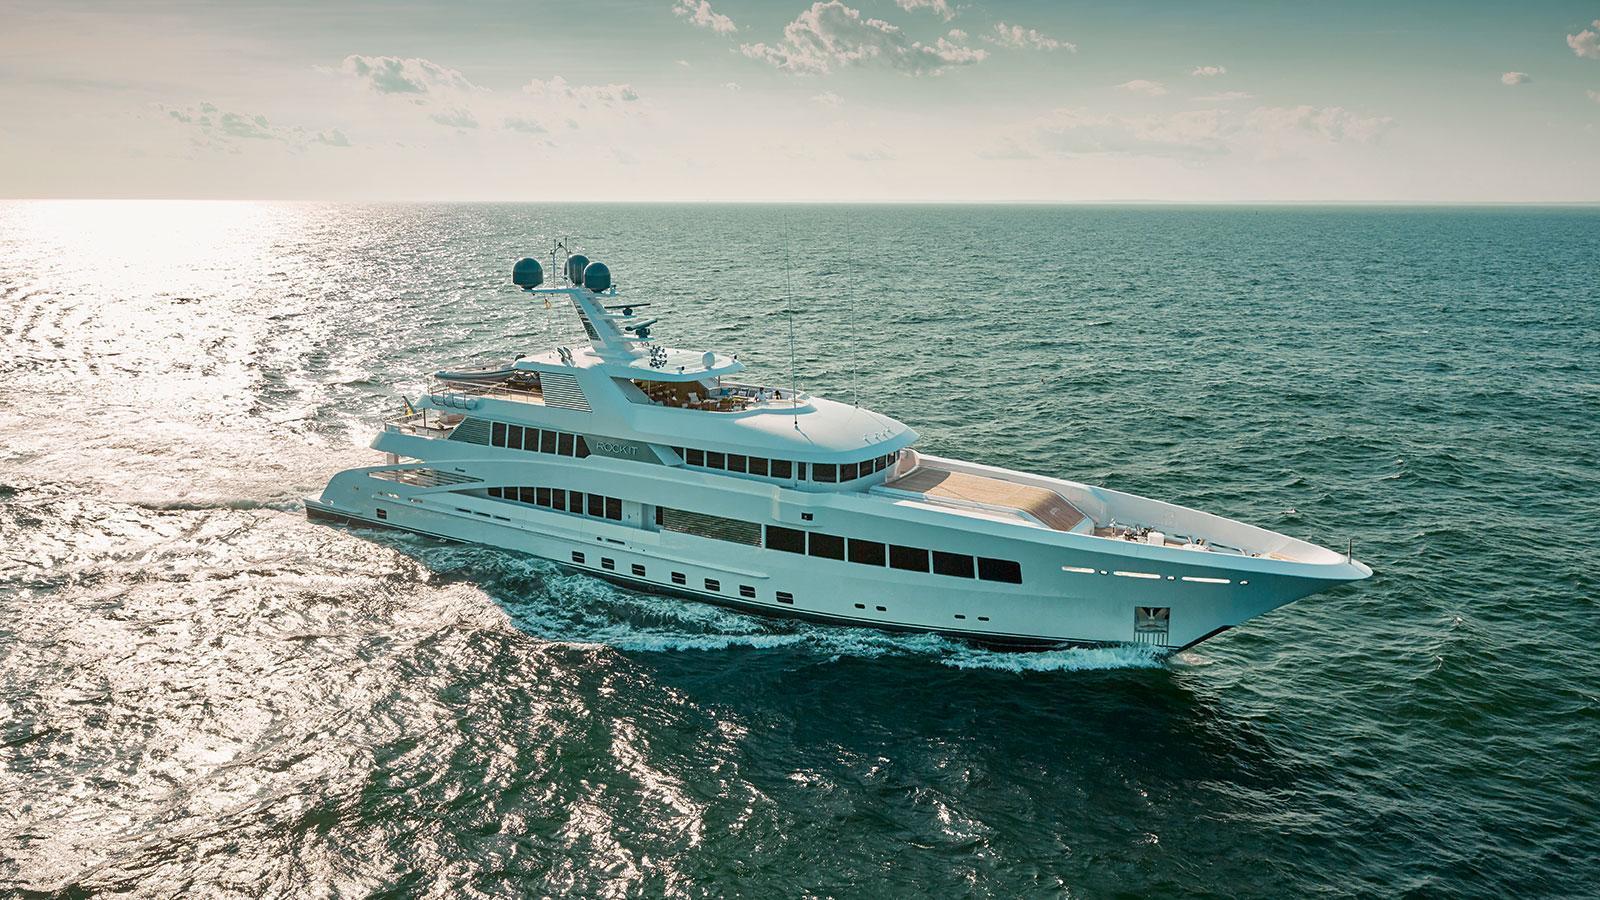 rock-it-motor-yacht-feadship-2014-60m-half-profile